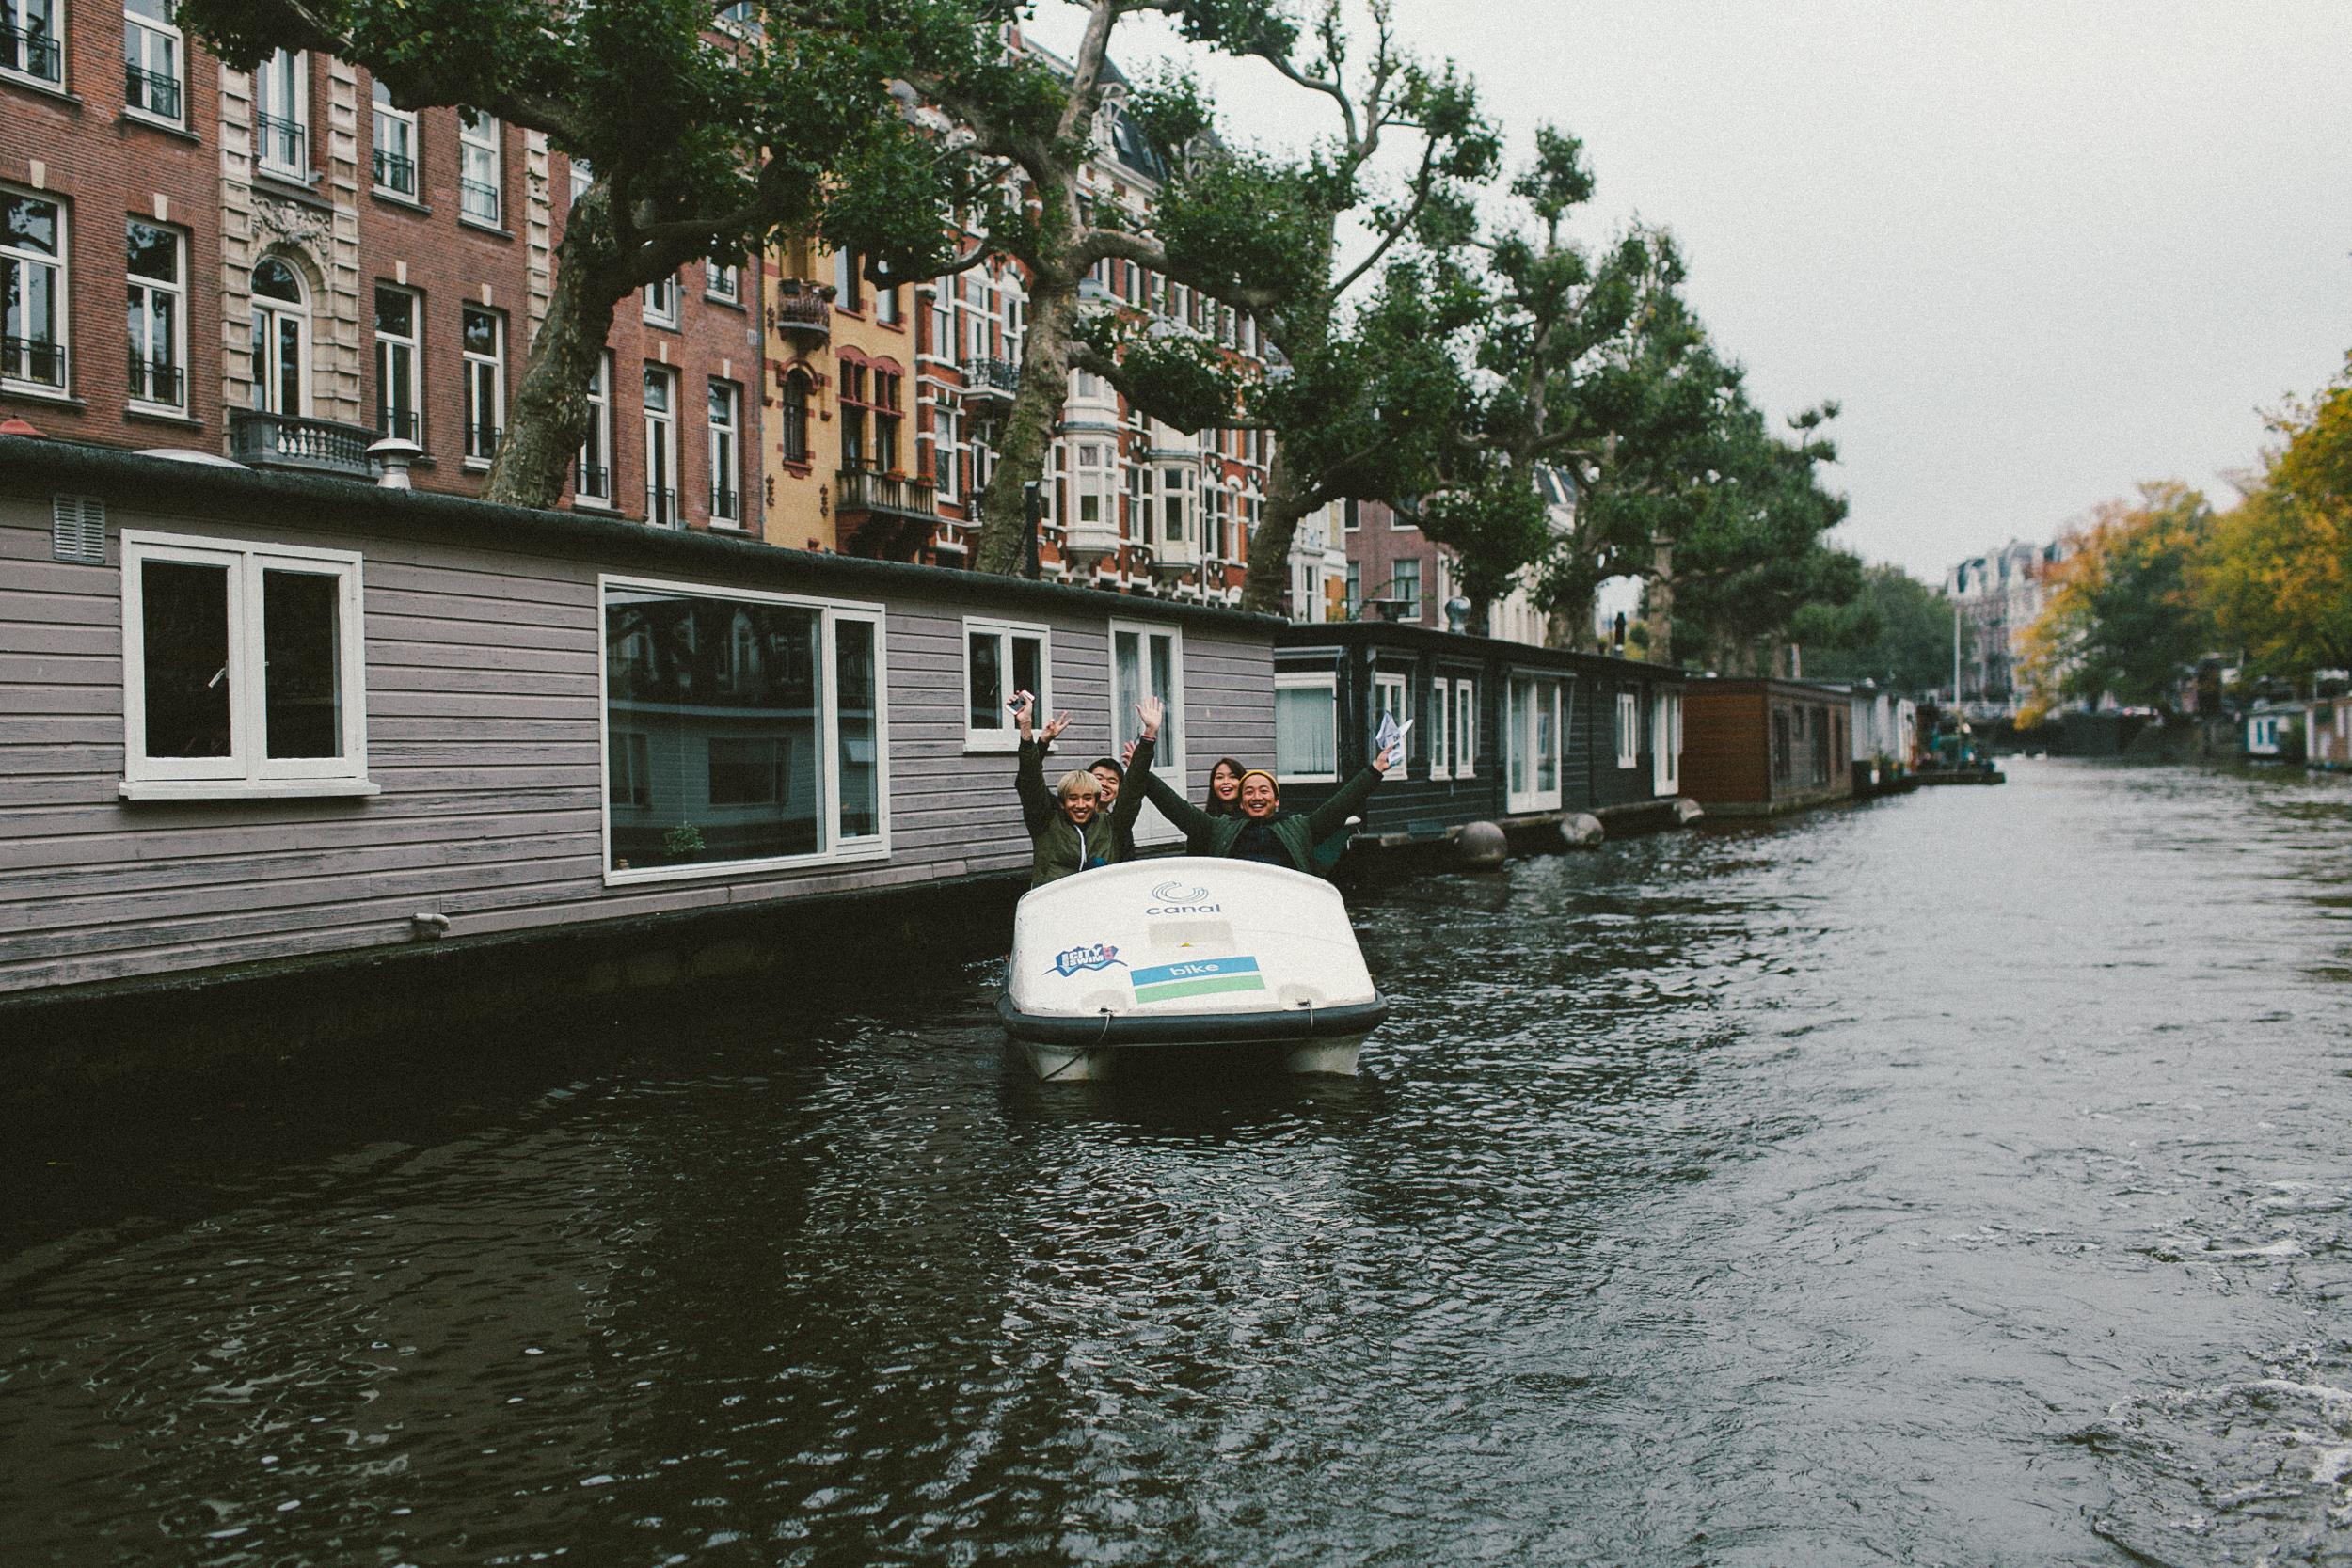 amsterdam_sqsp_33.jpg